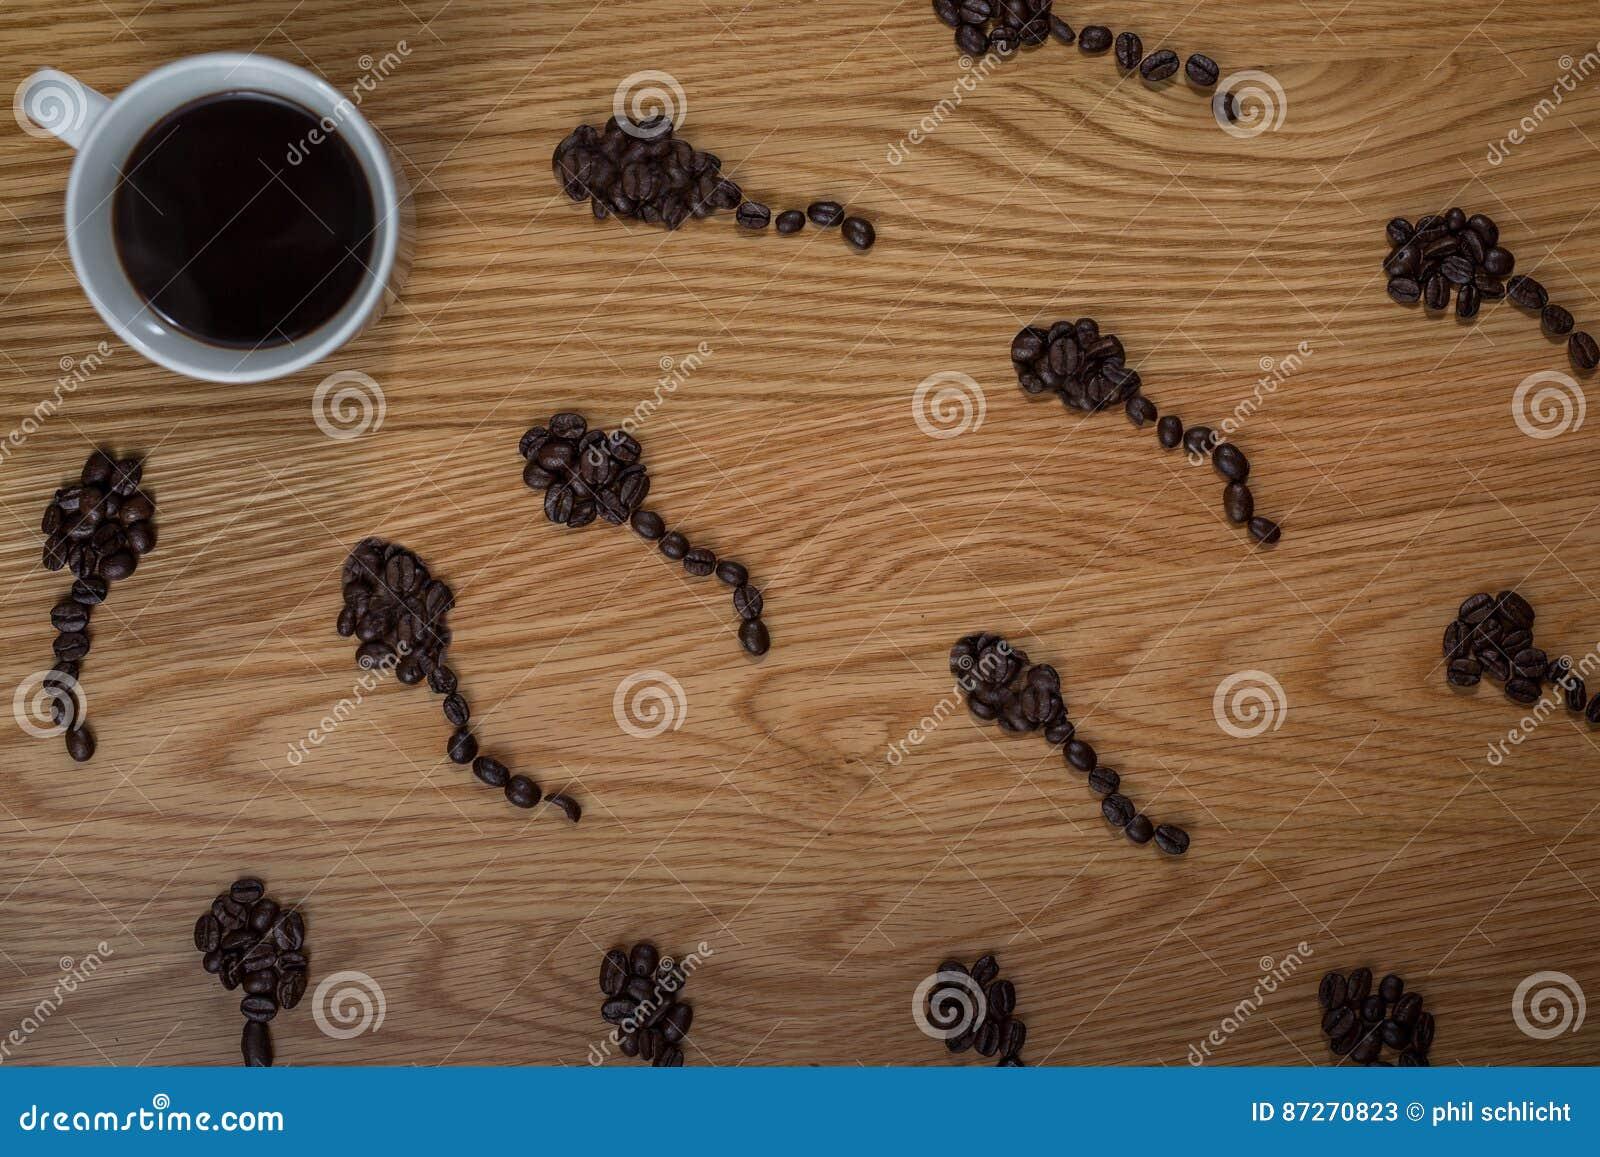 is-caffeine-good-for-sperm